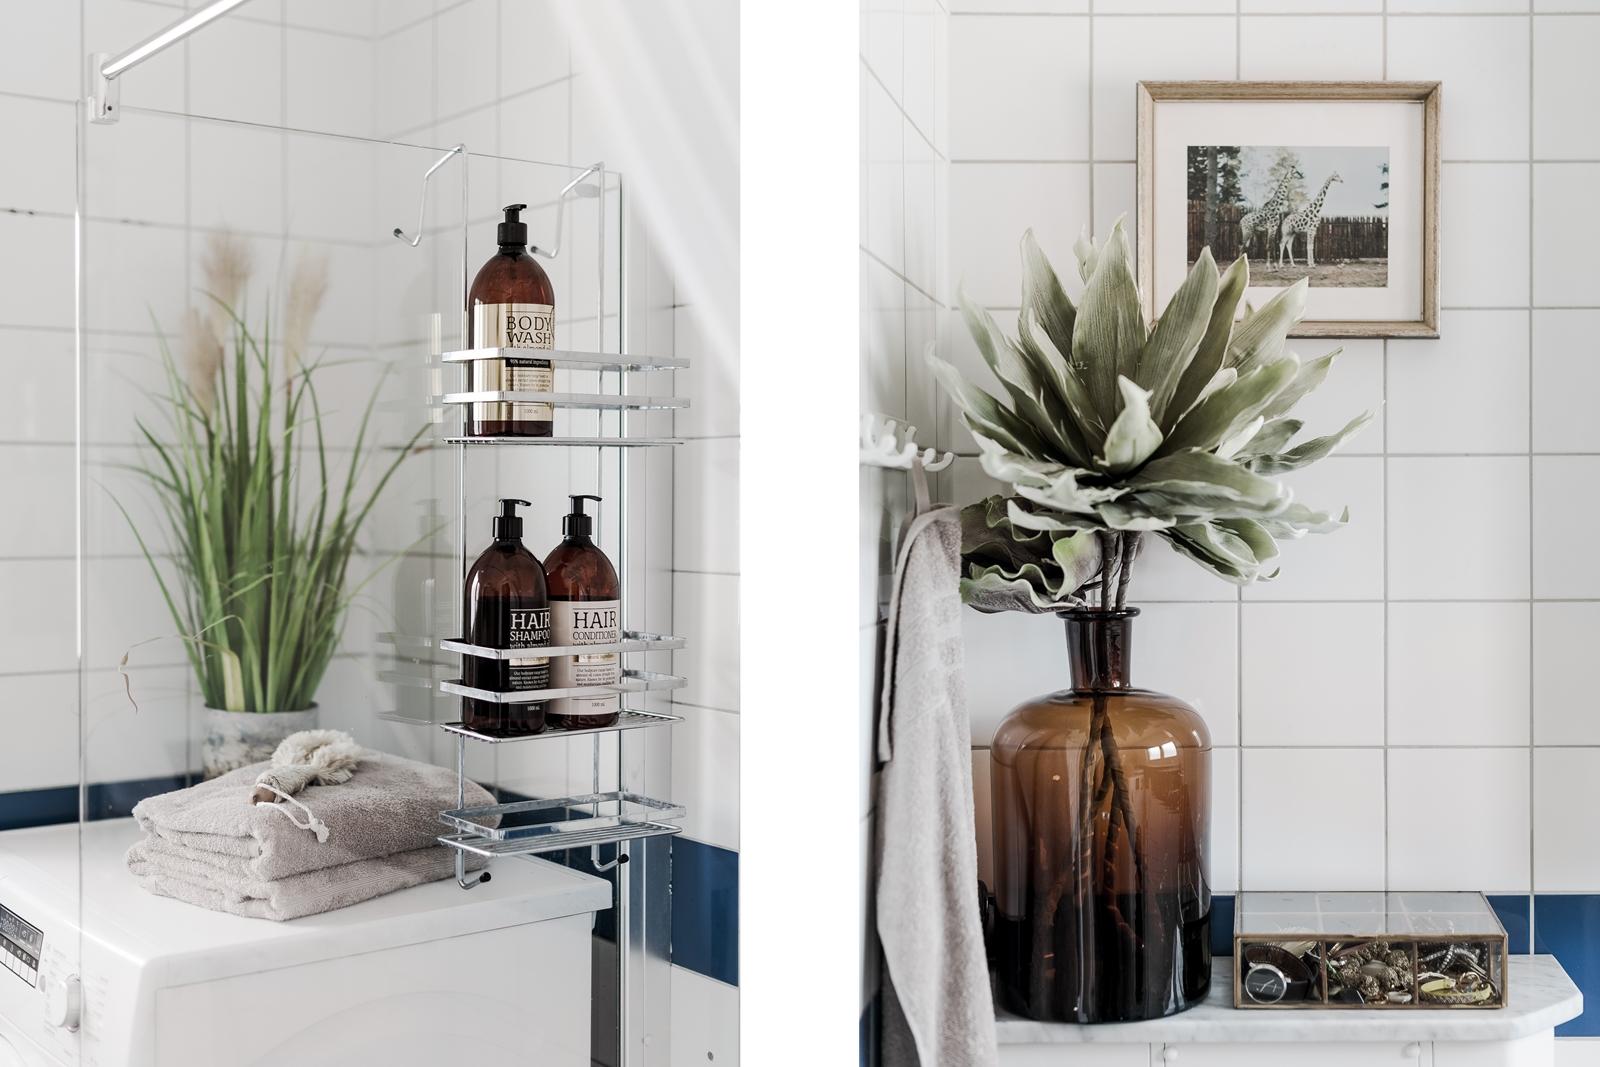 санузел белая плитка душ стекло полки стиральная машина ваза